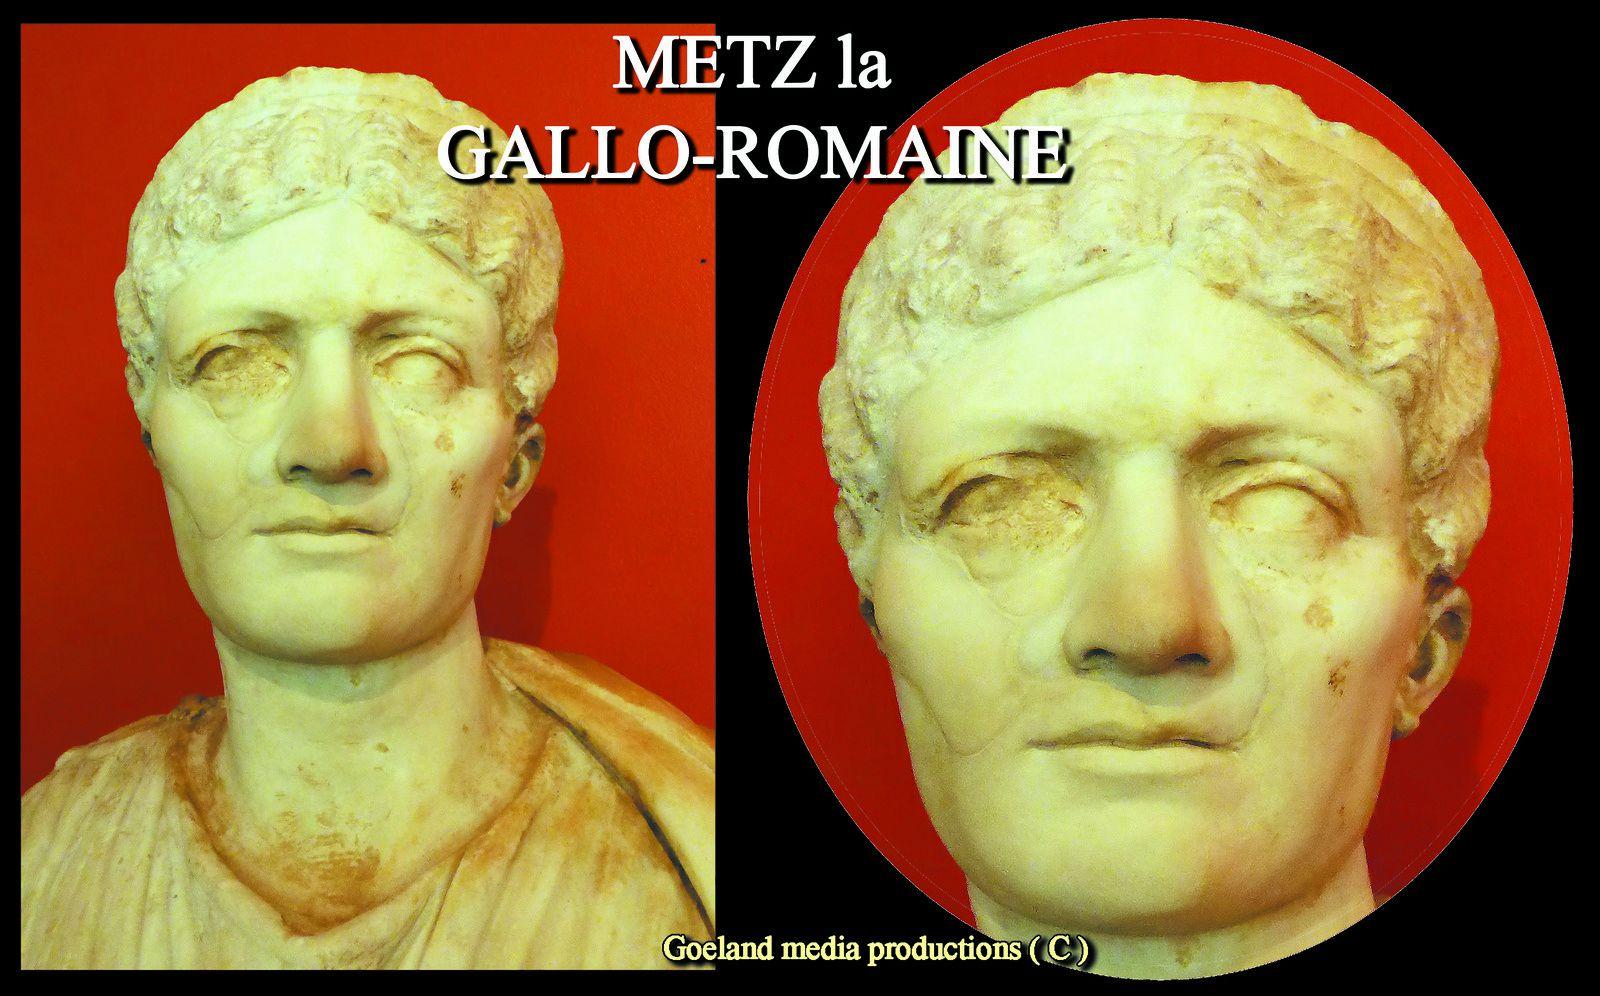 TETE monument Funéraire - ( Metz ) - MUSEE de la COUR d'OR - collections Gallo-Romaines